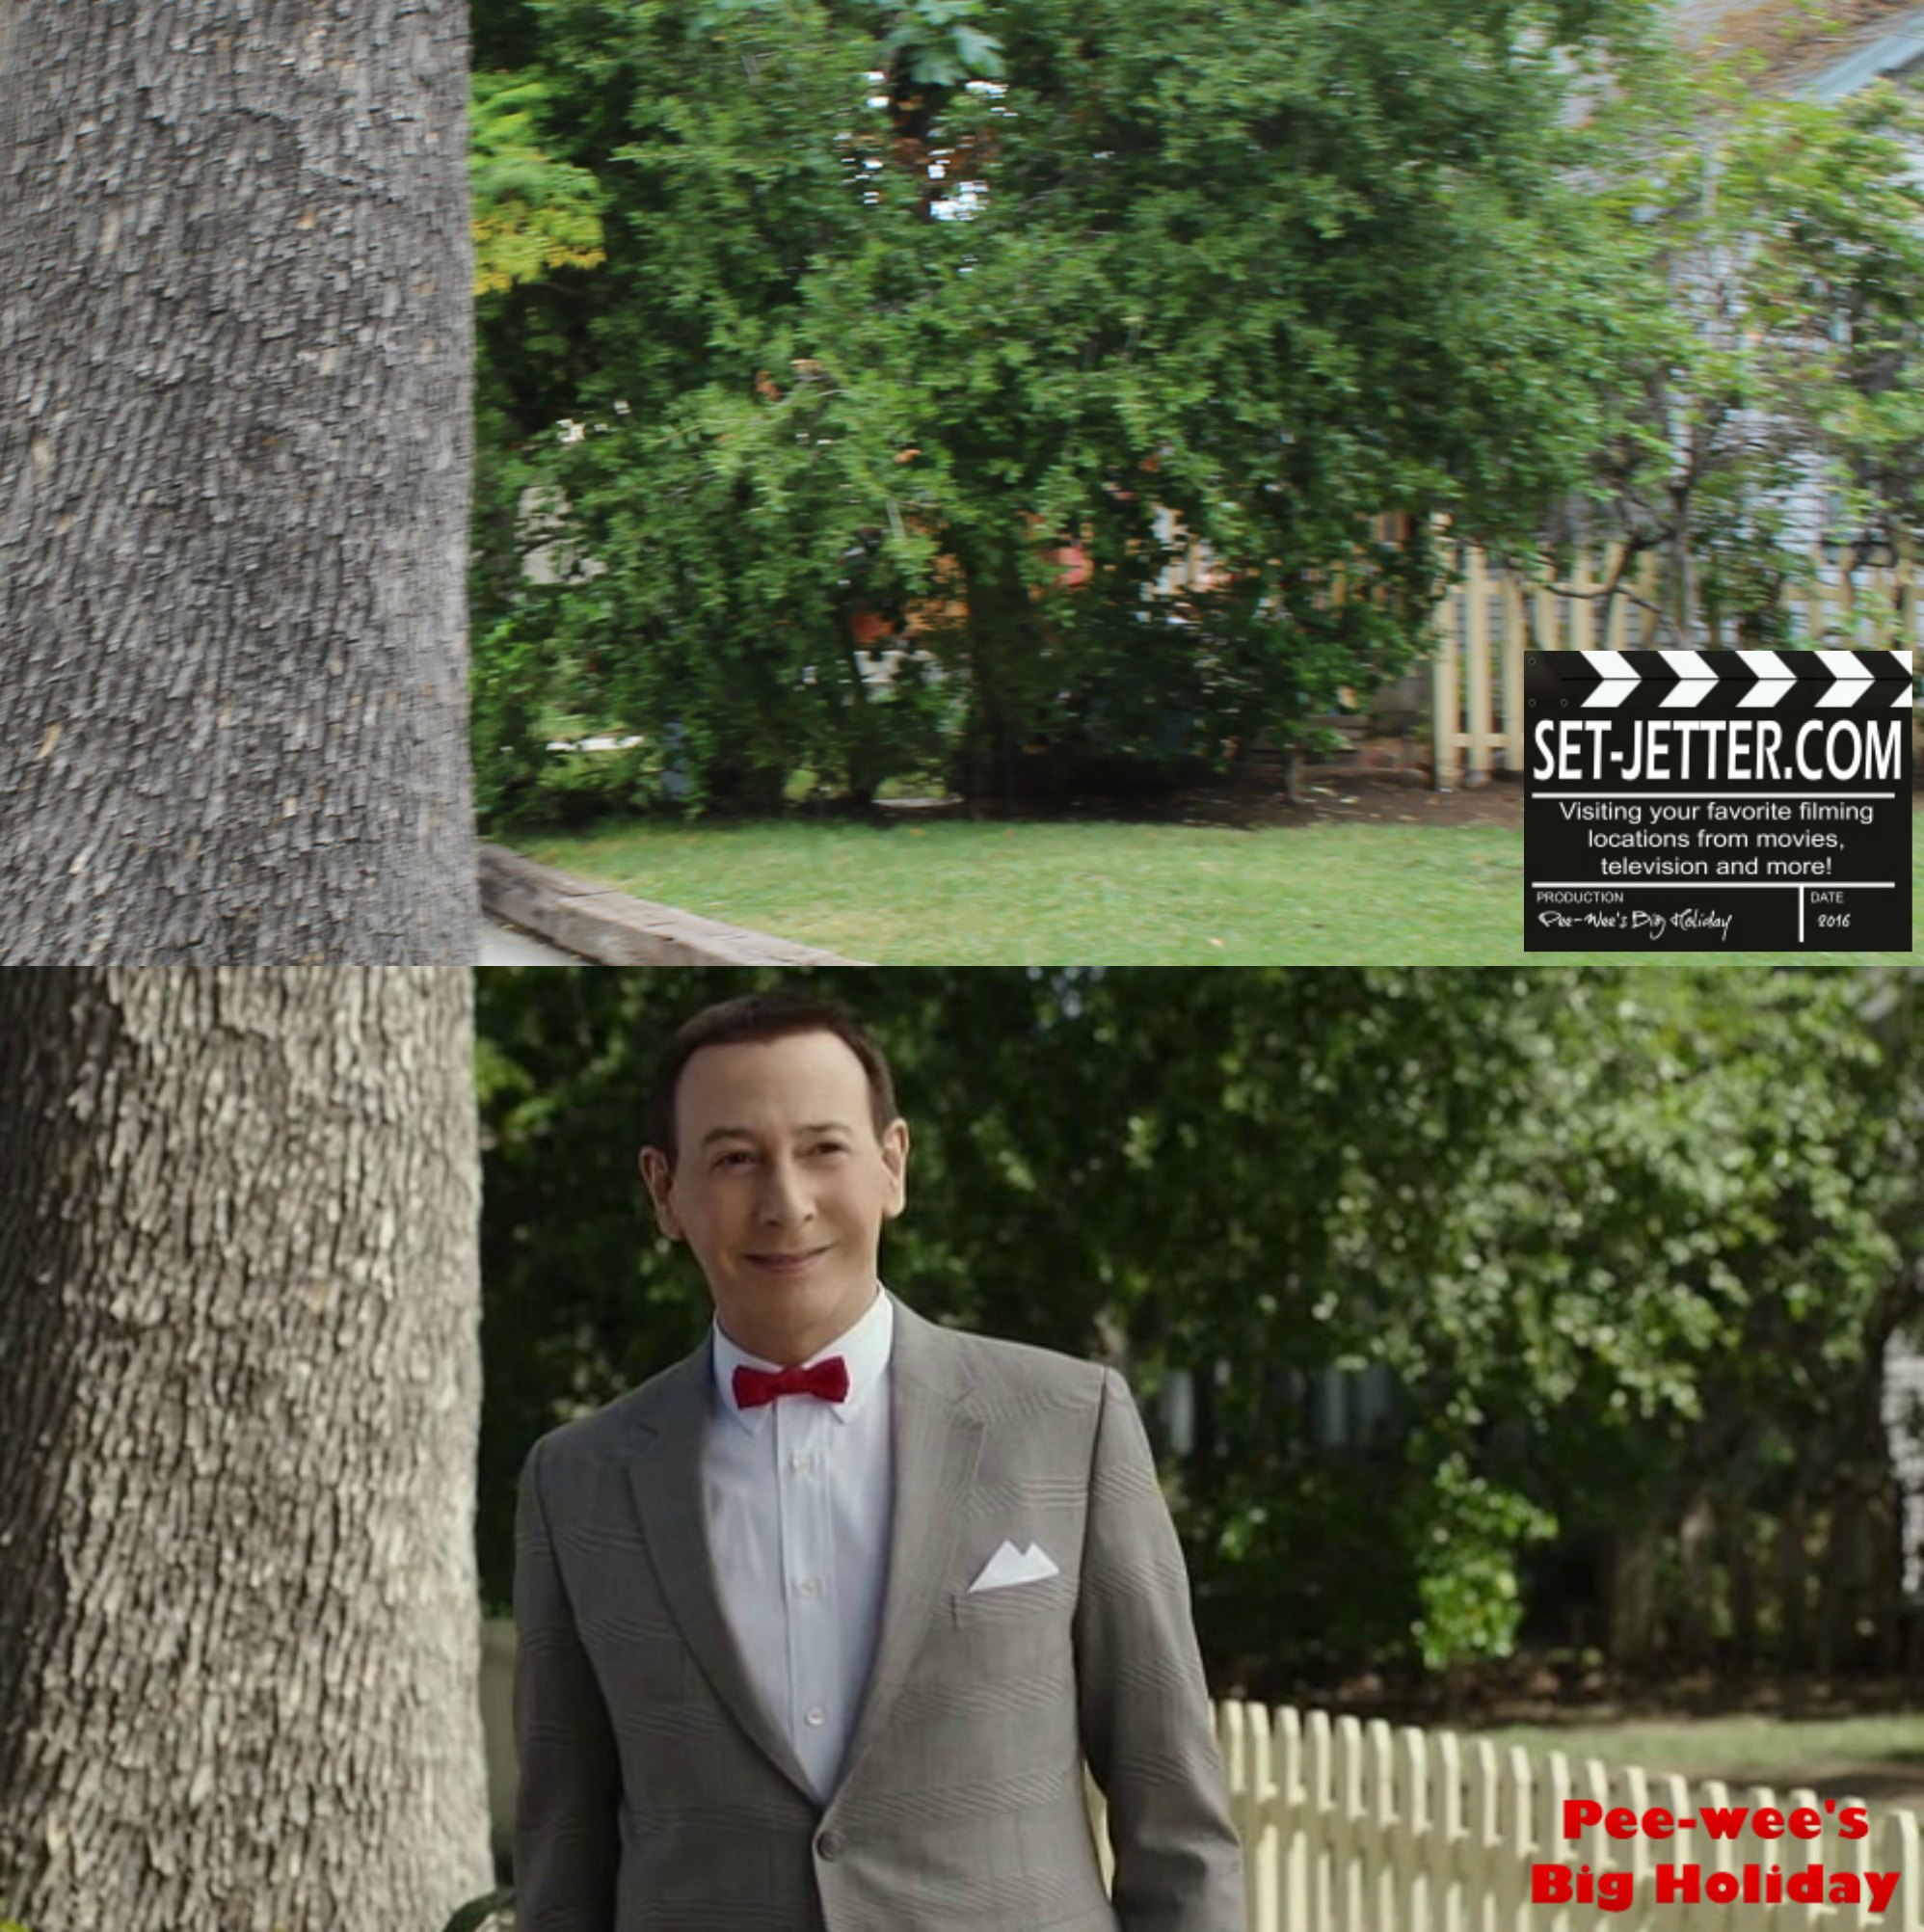 Pee Wee's Big Holiday comparison 317.jpg